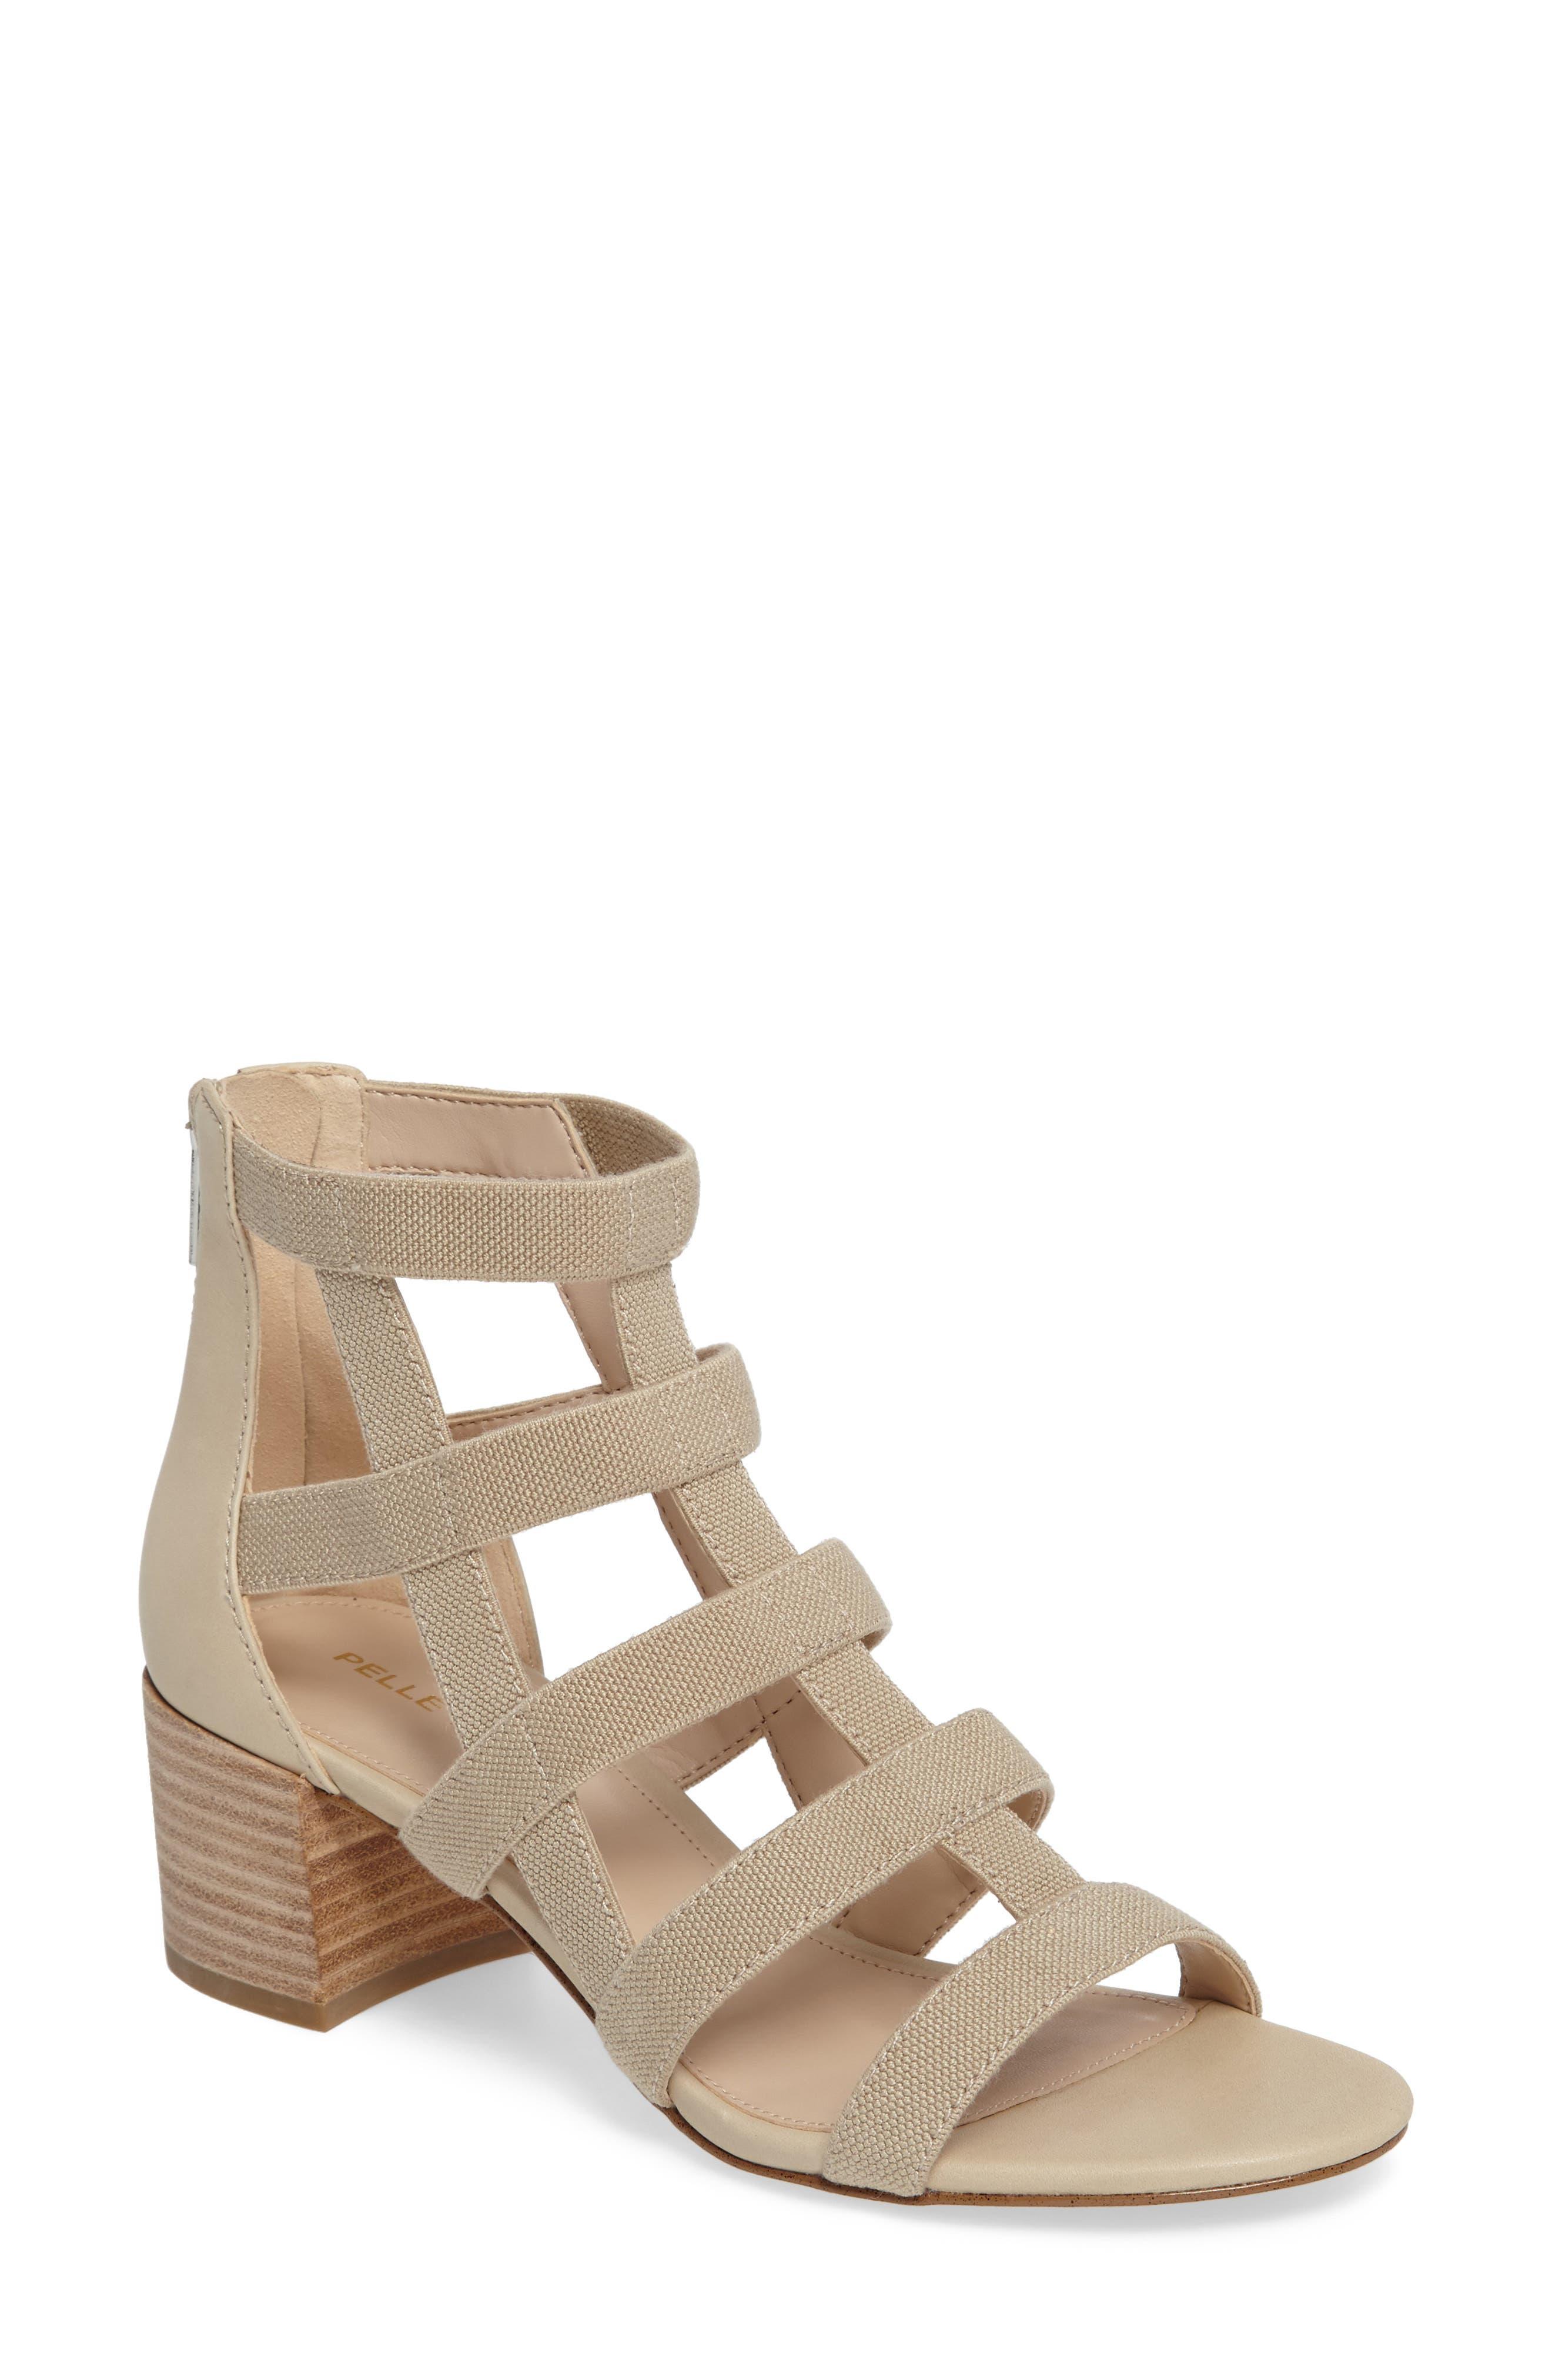 Alternate Image 1 Selected - Pelle Moda Unkar Block Heel Sandal (Women)